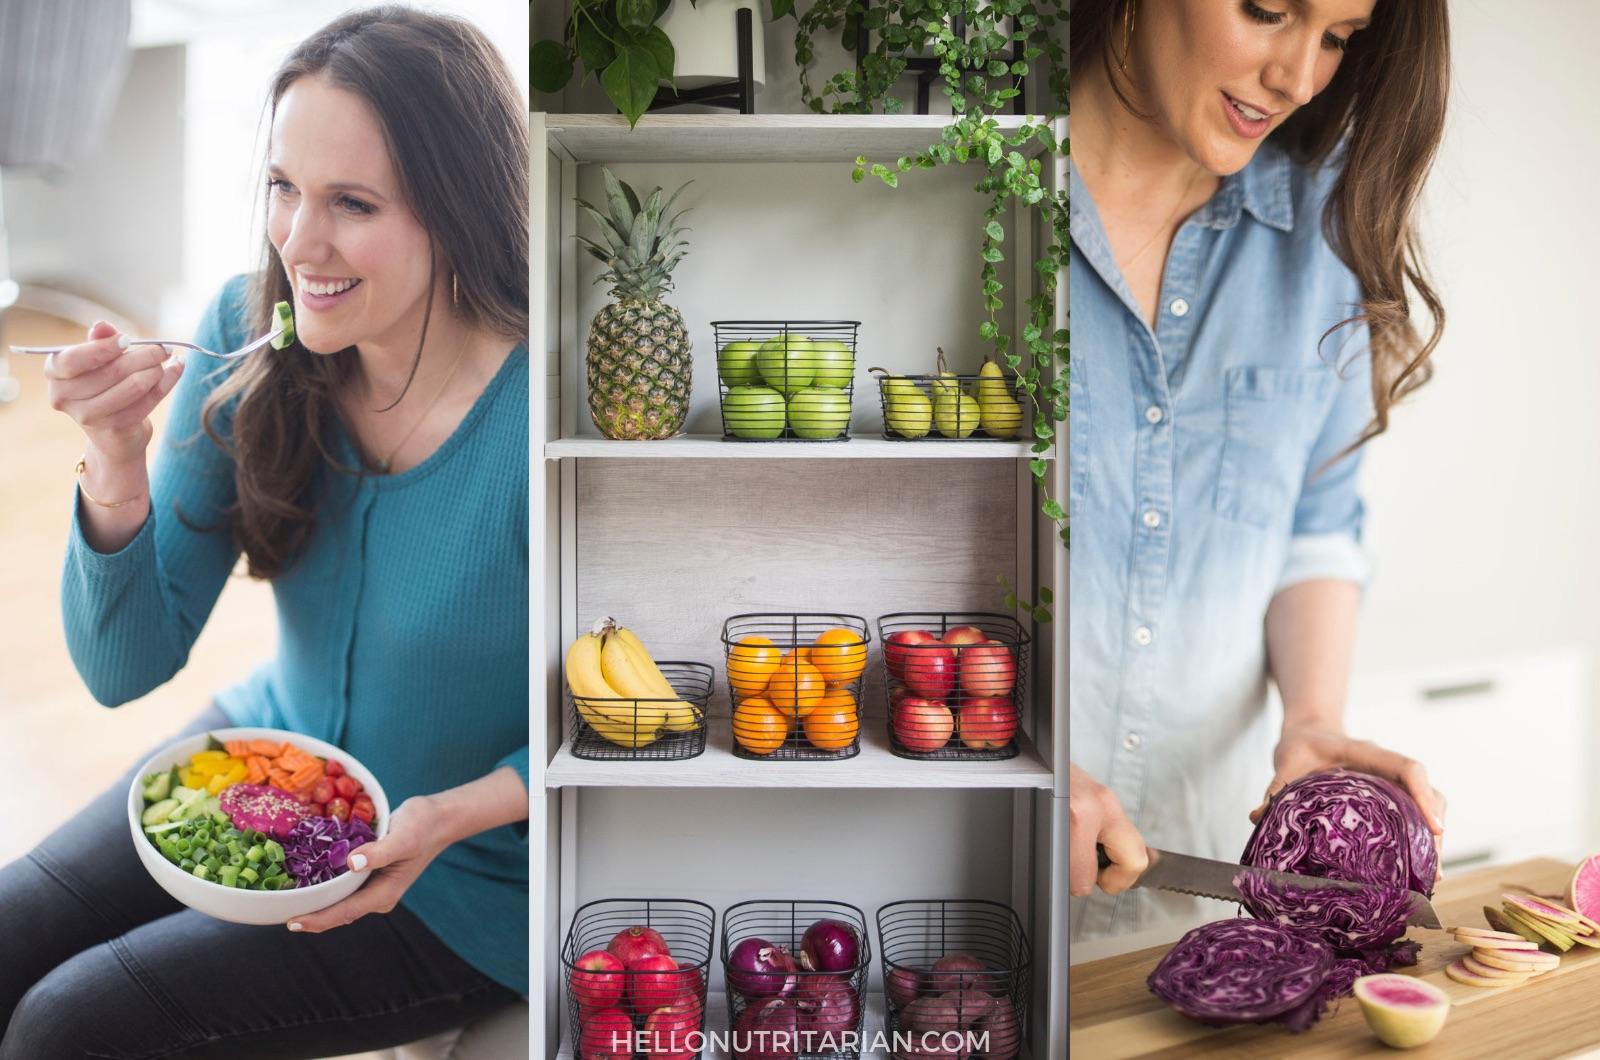 Start Here Hello Nutritarian Quick Start Guide Pic 2